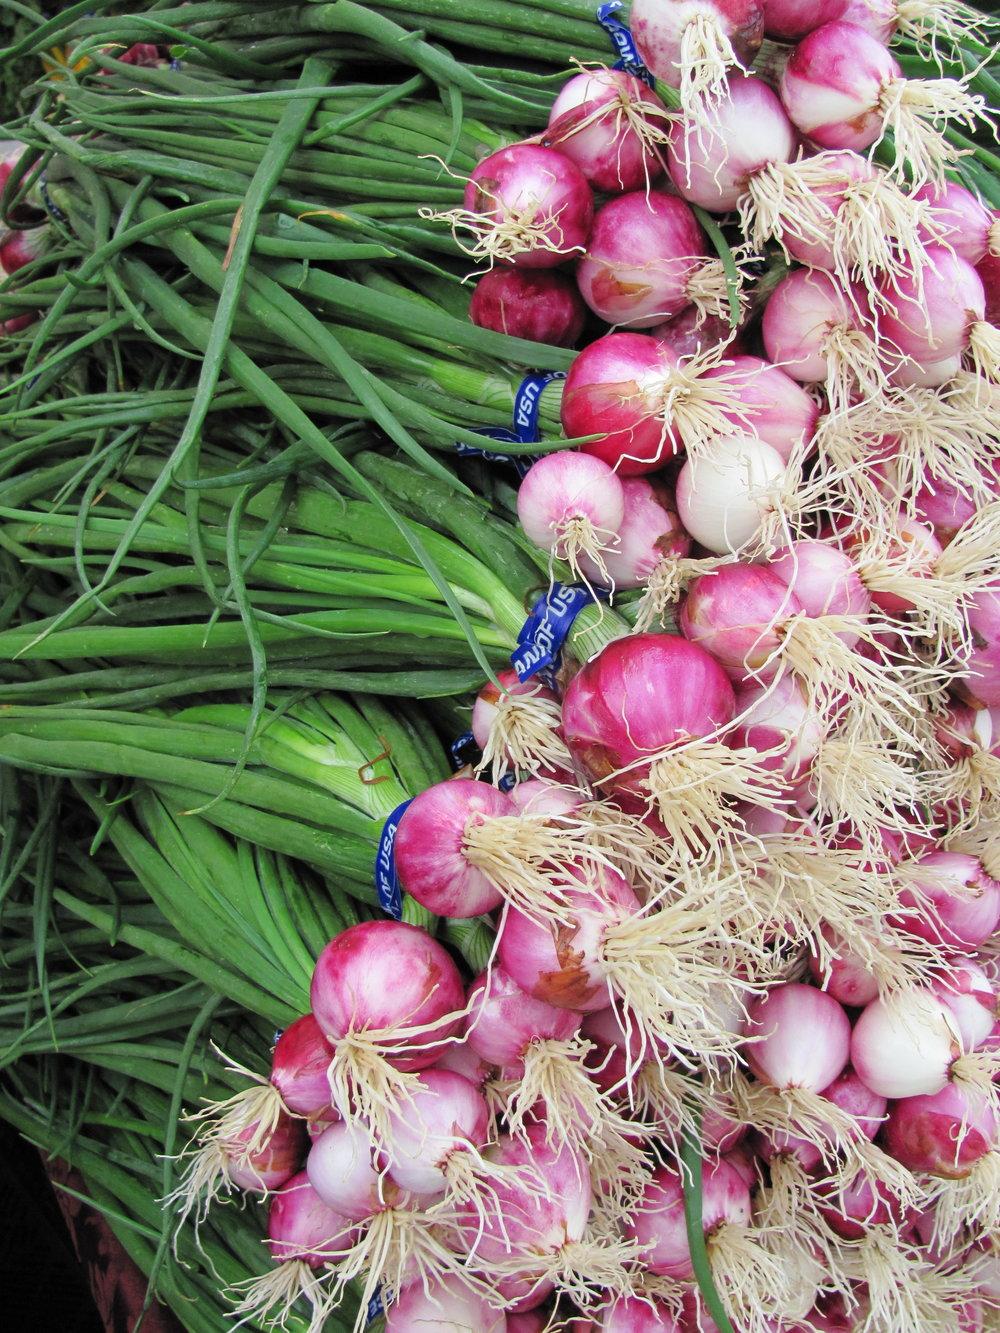 onions IMG_0625.JPG